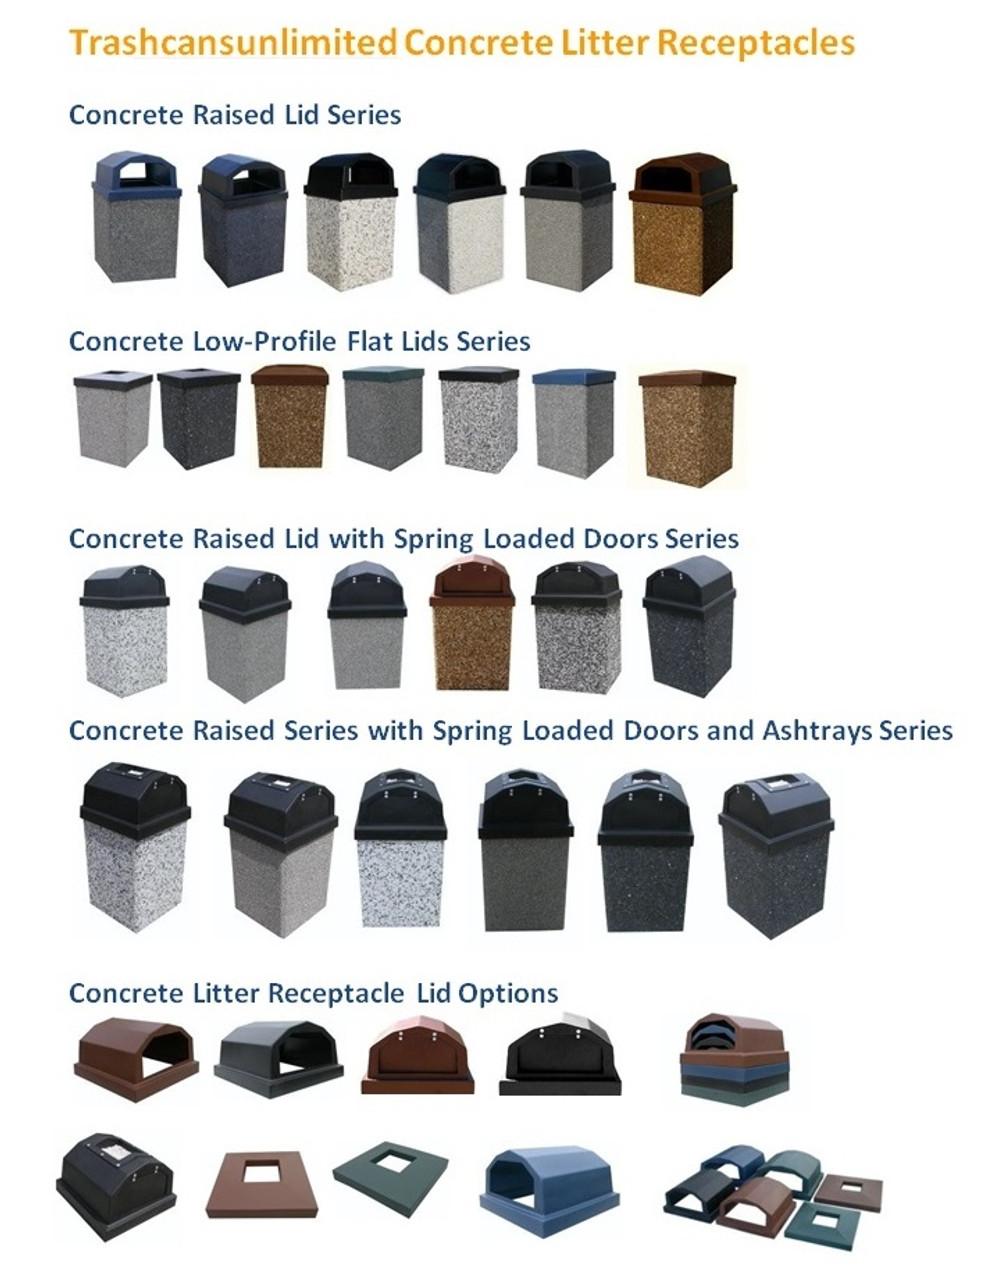 Trashcans Unlimited Concrete Trash Cans